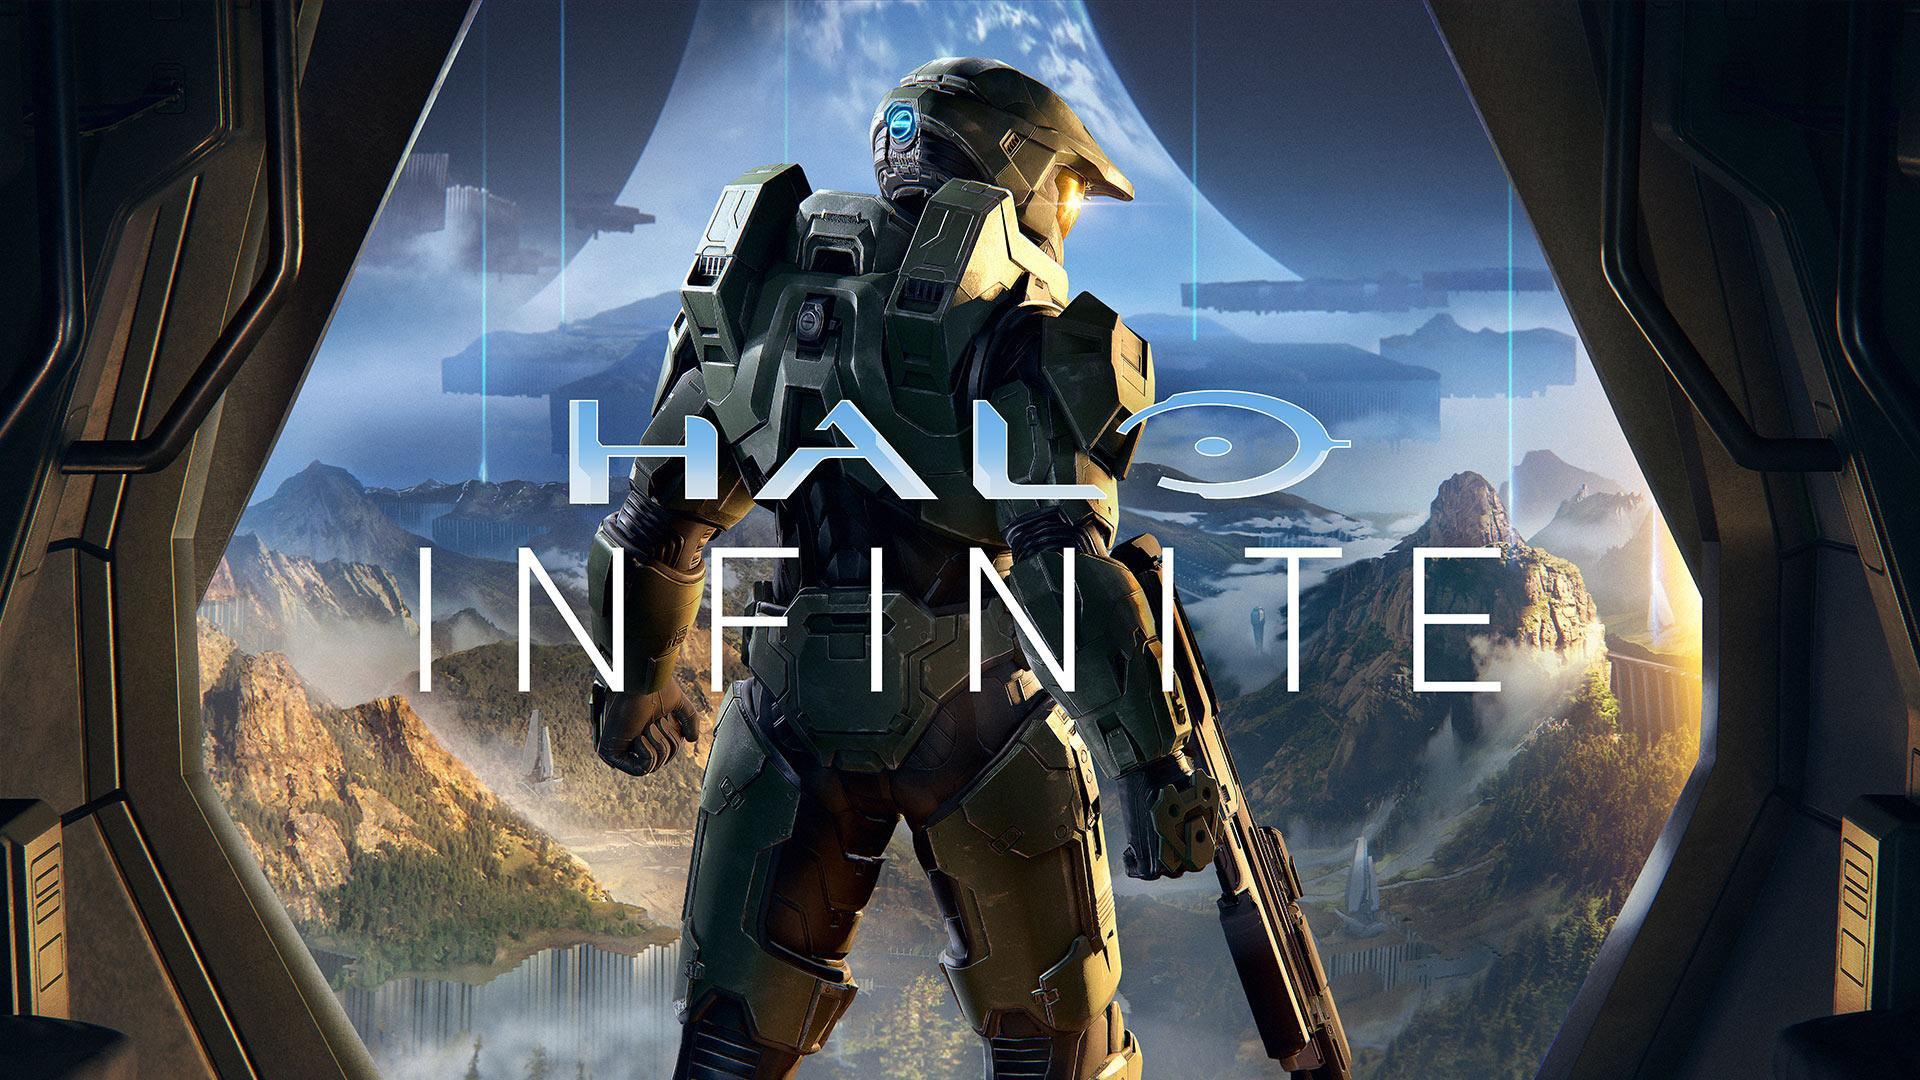 Microsoft, Xbox Series X, Halo, 343 Industries, Halo Infinite